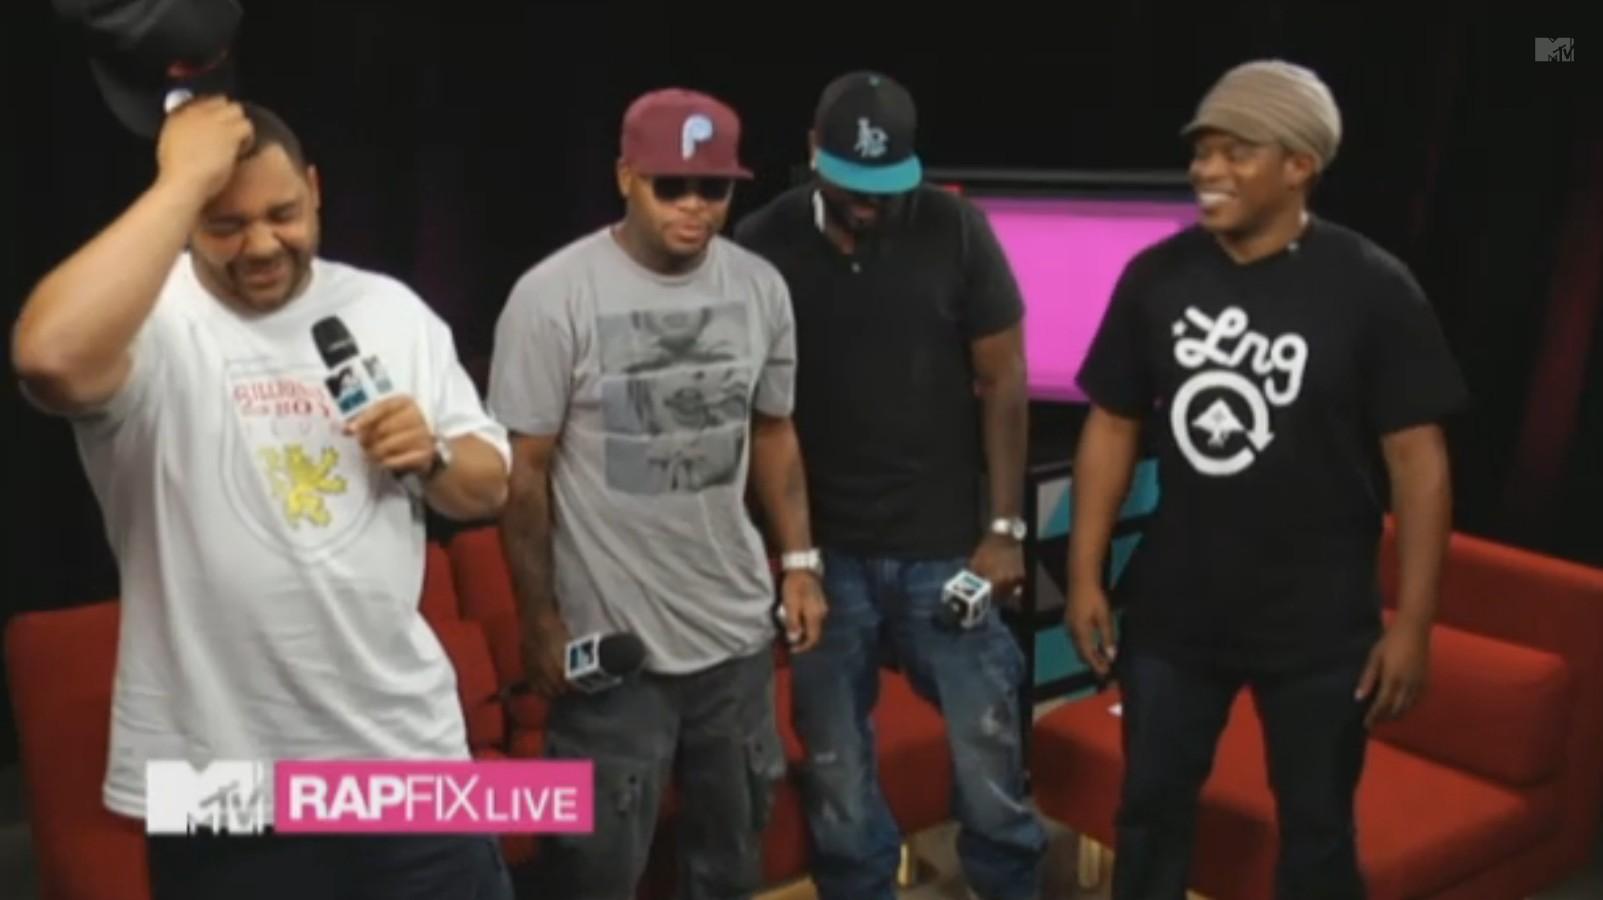 Slaughterhouse празднуют выход «Our House» на «RapFix Live».